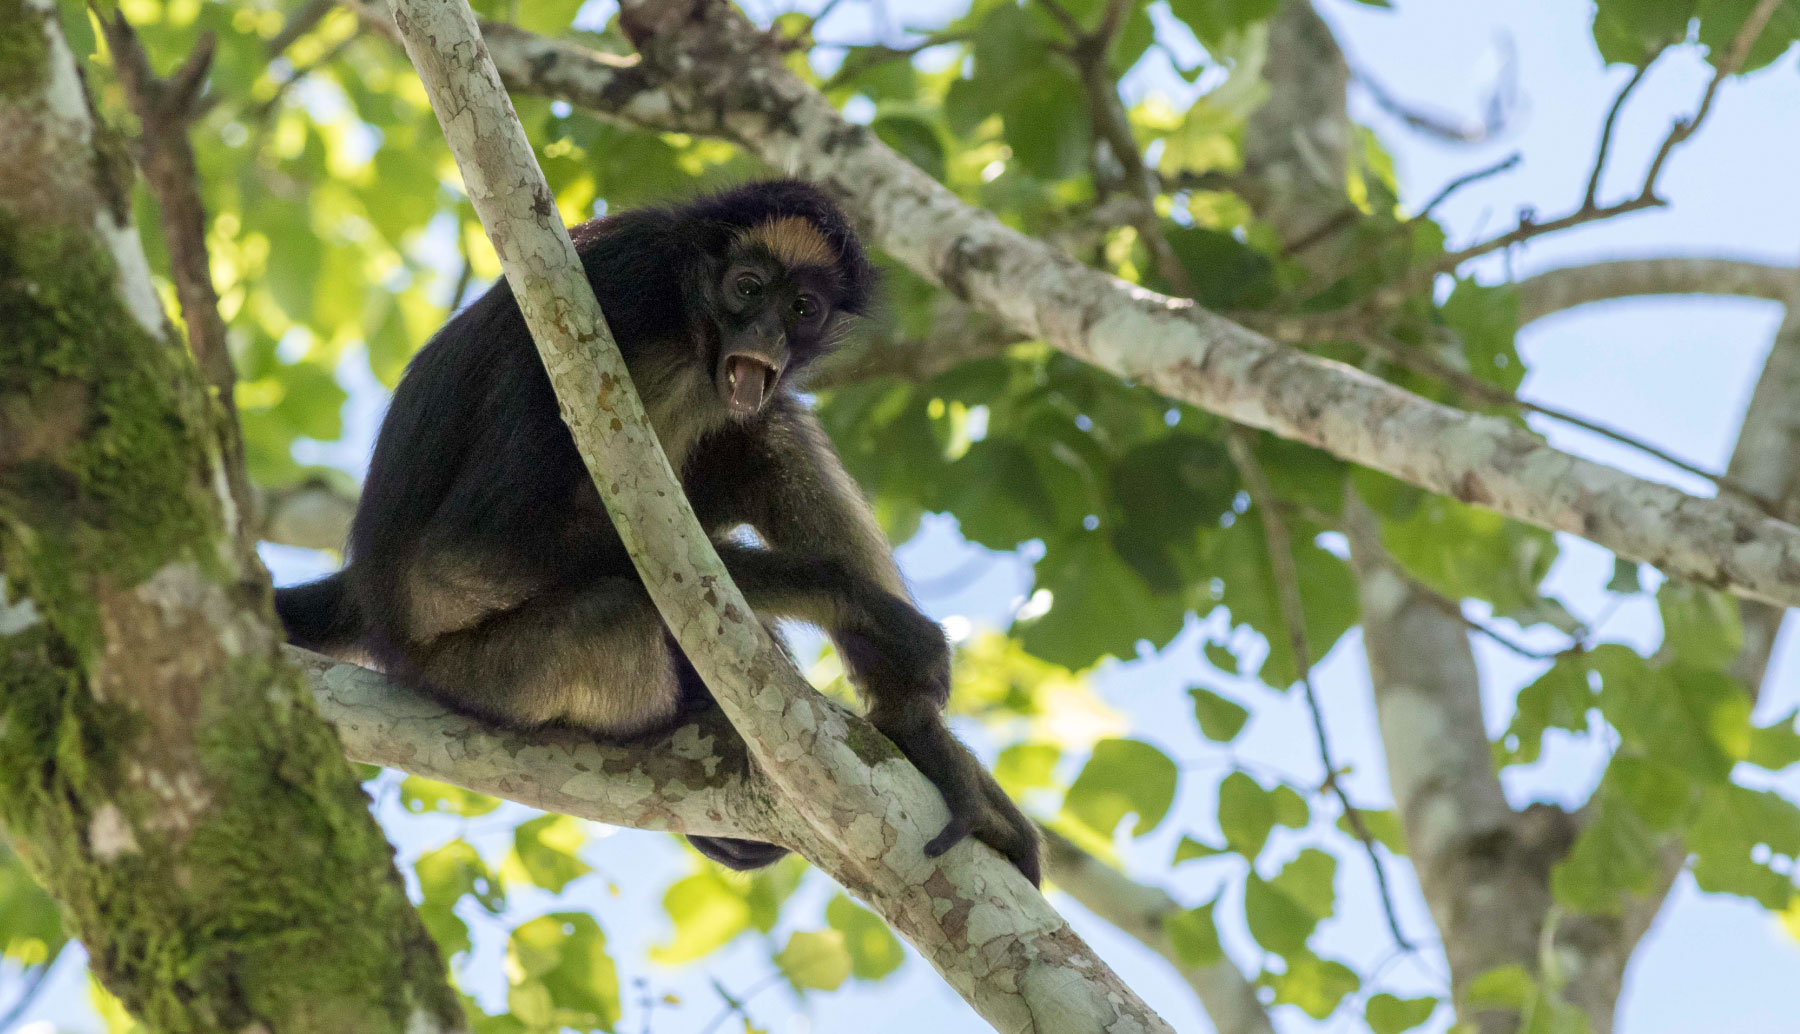 Monkey in a tree in Napo, Tena